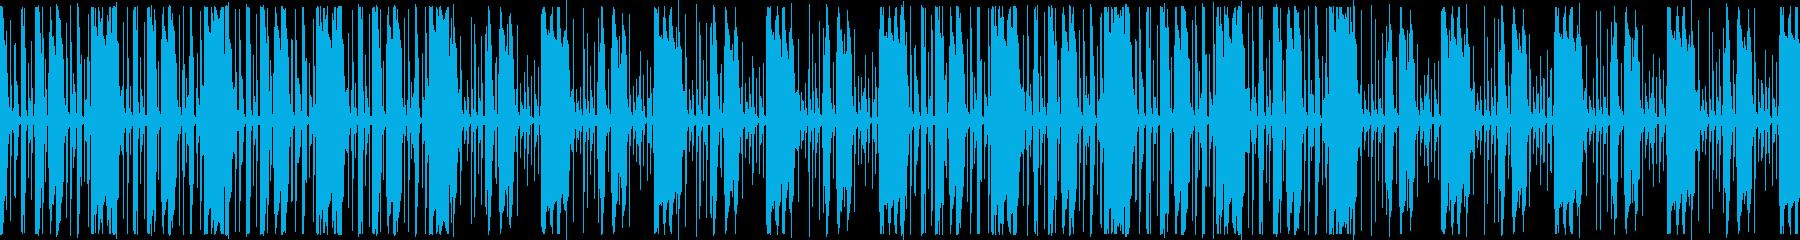 CFB-002 Loopの再生済みの波形